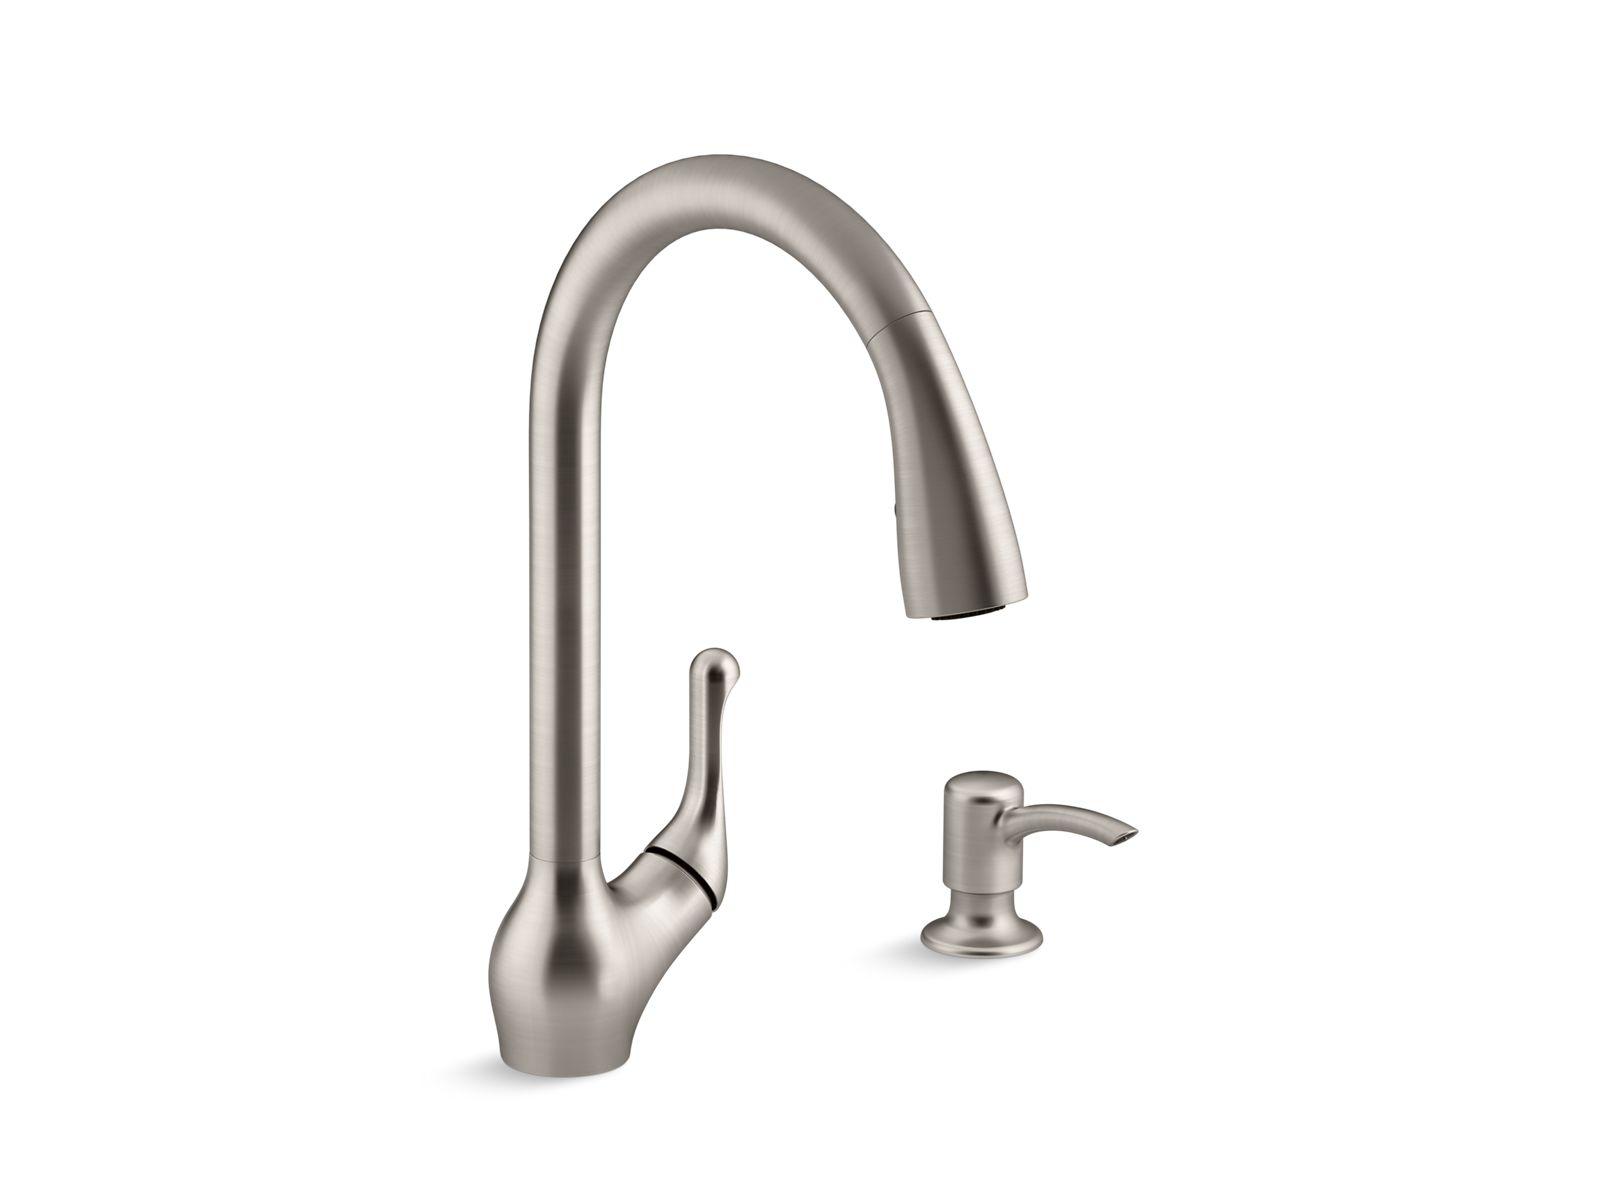 K R78035 SD | Barossa® Touchless Pull Down Kitchen Faucet With Soap/lotion  Dispenser | KOHLER